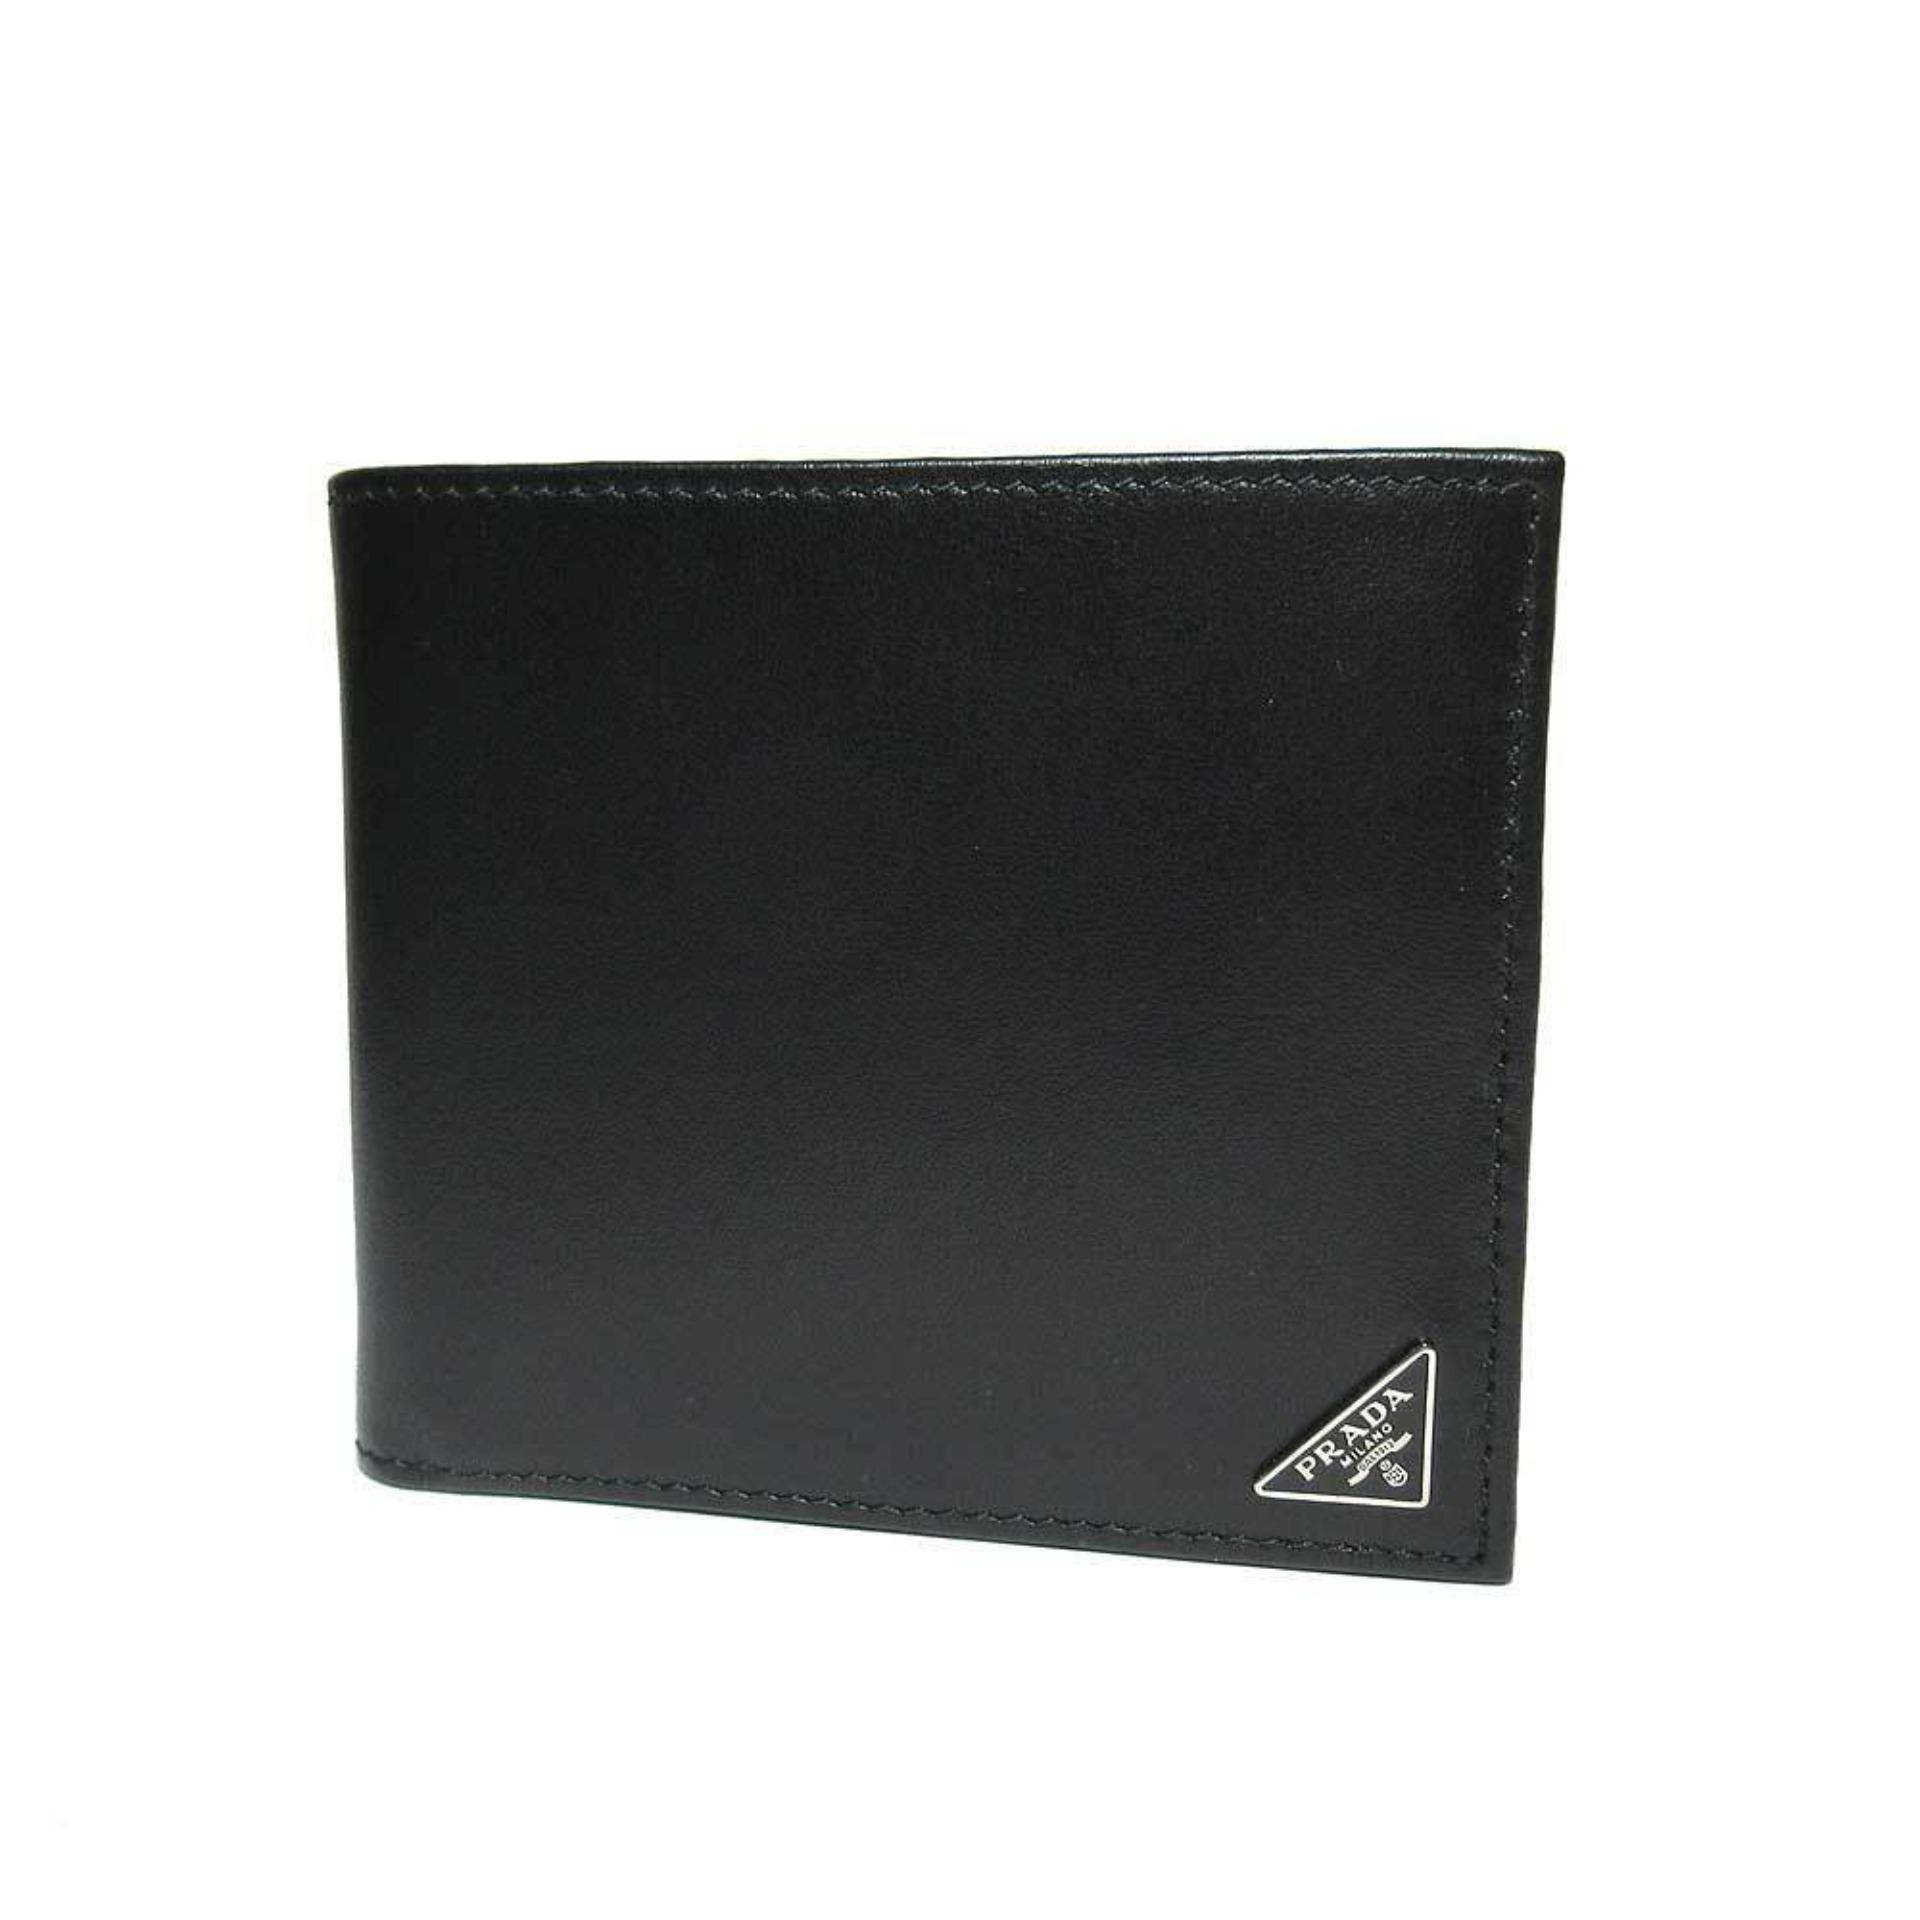 196105f3 spain prada money clip wallet for men 065ca d1814